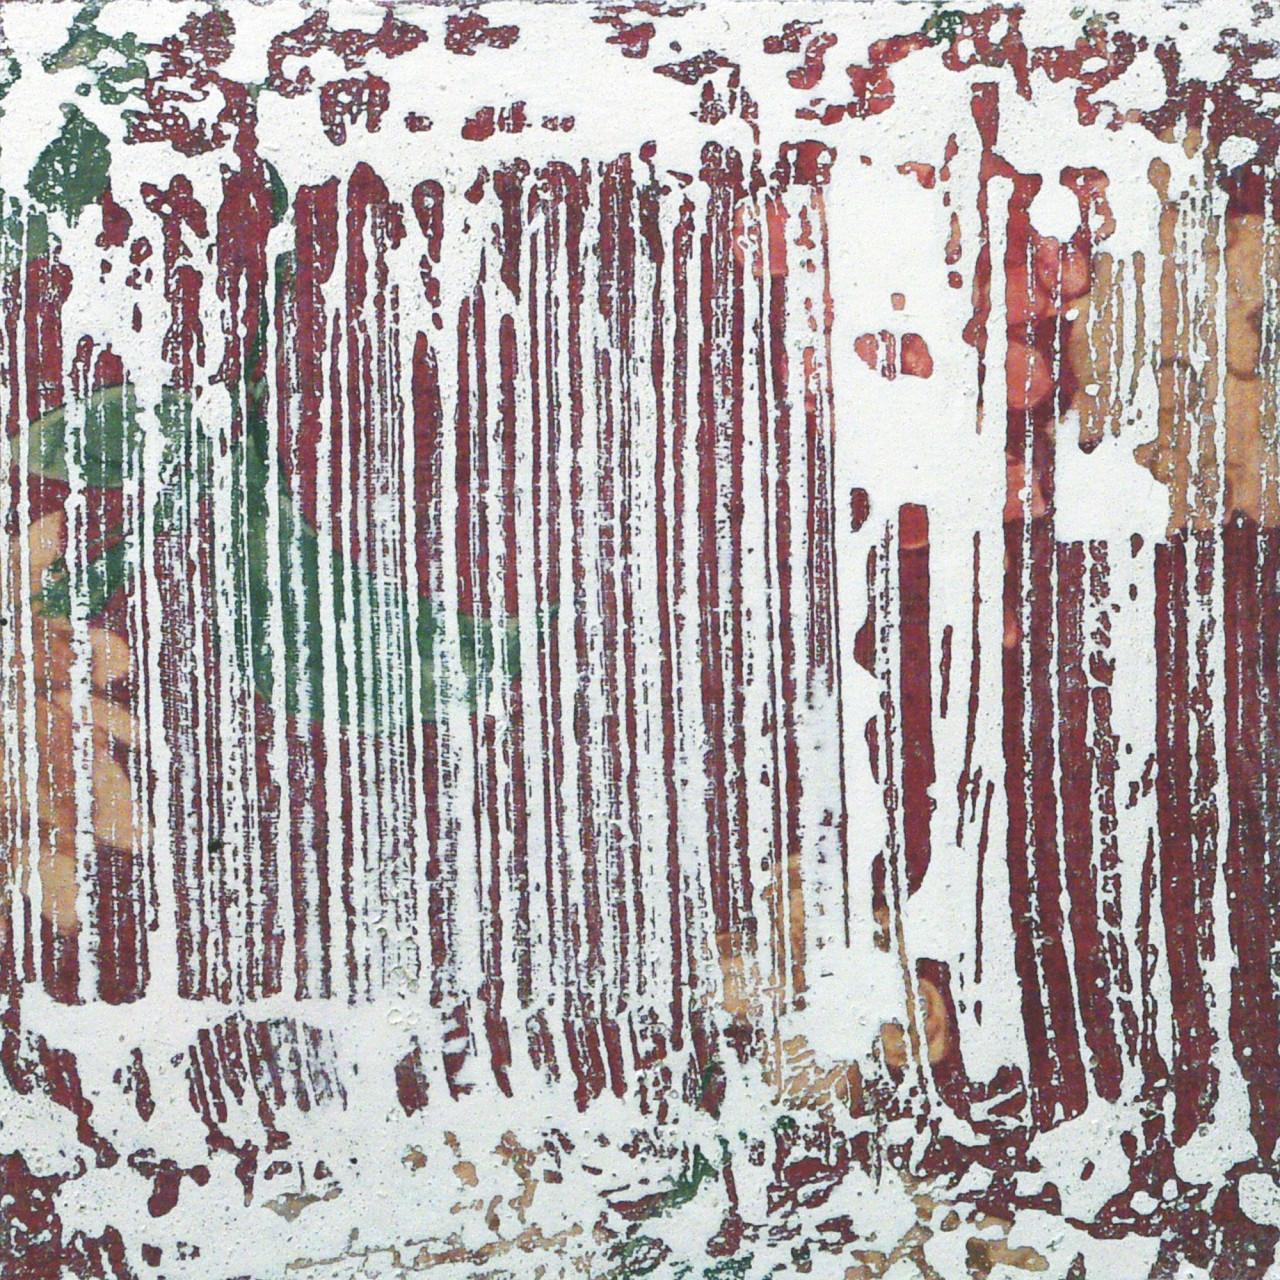 623.5, 2015 tecnica mista su tavola 23x23 cm